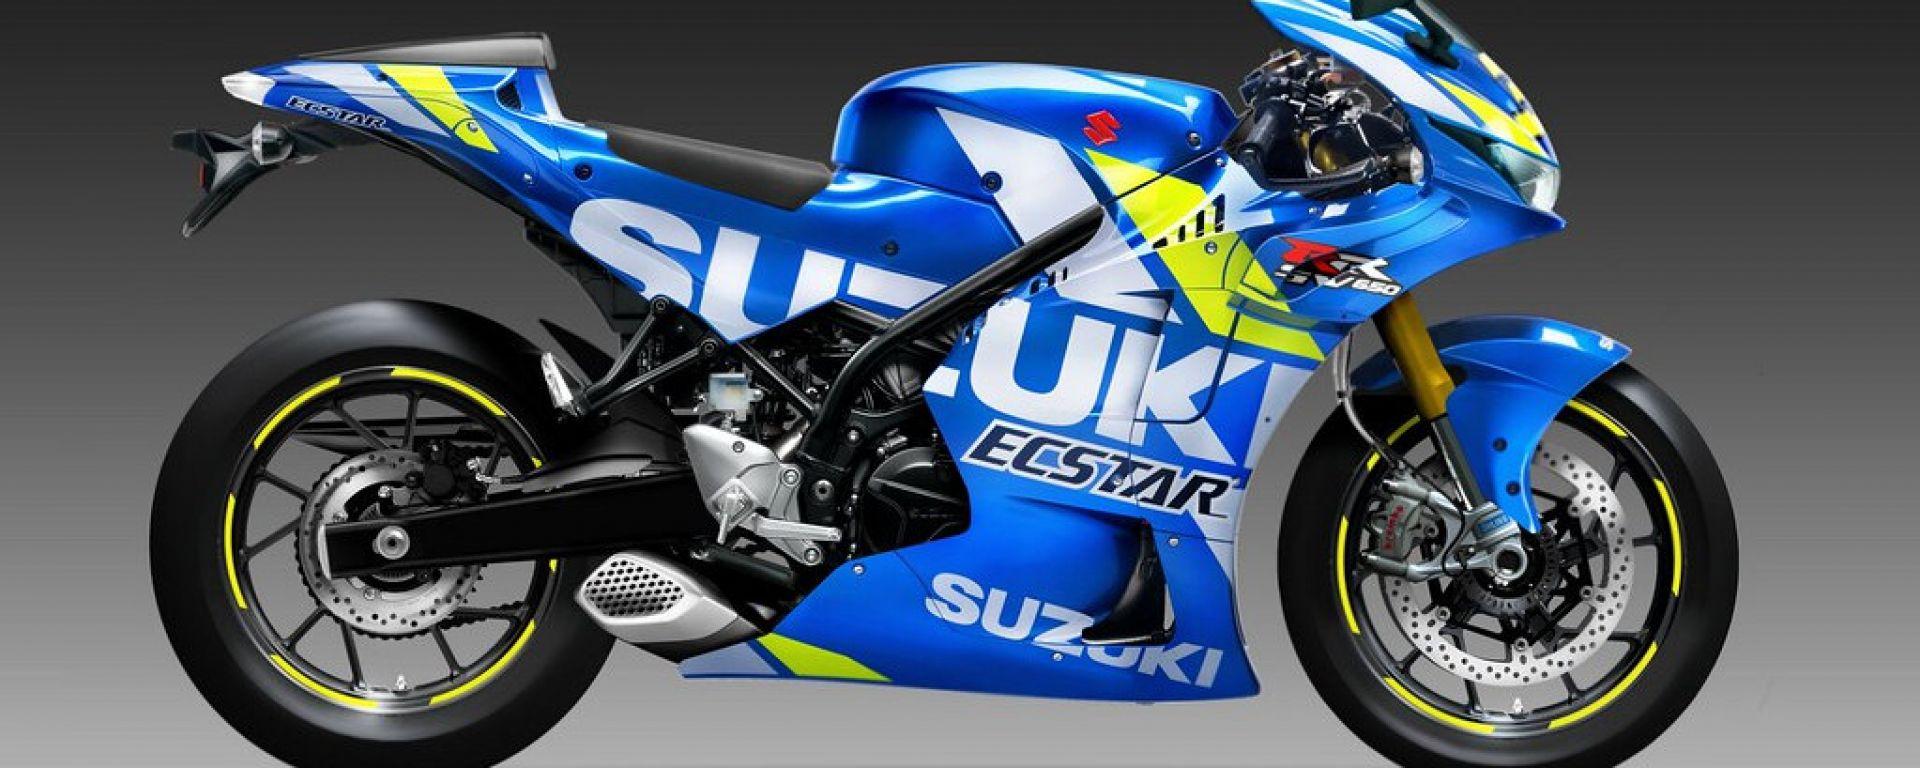 La Suzuki SV650 arriverà in versione RR, carenata stradale?